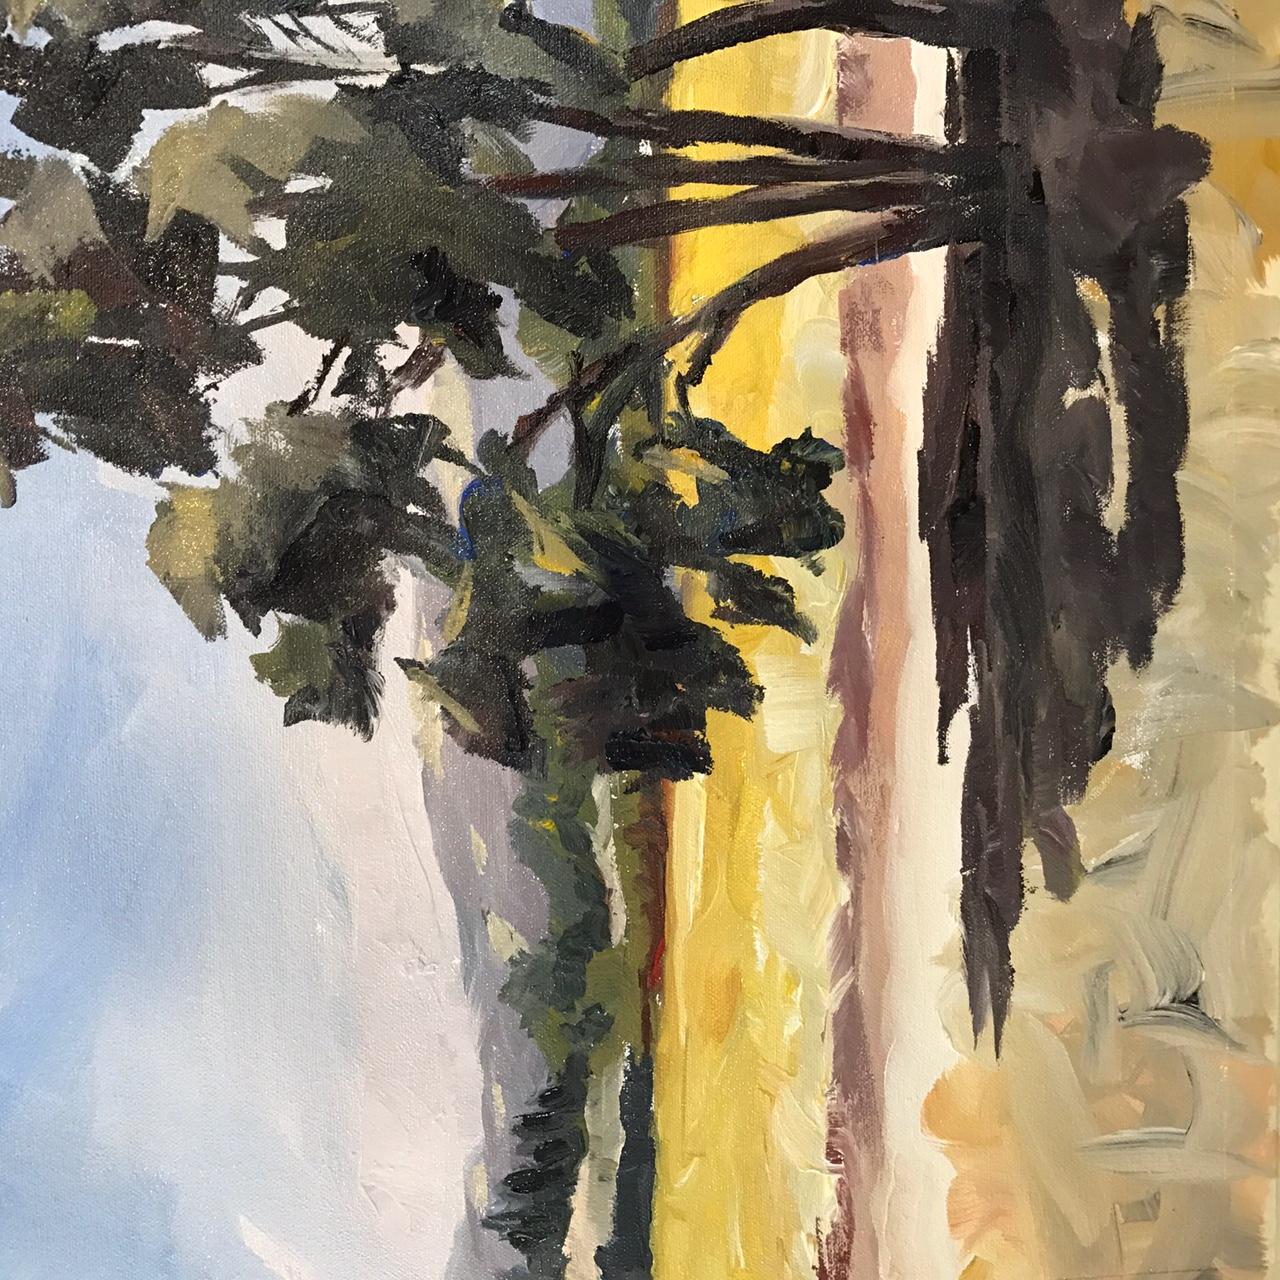 Chalk Hill Artist Residency Oct 2016